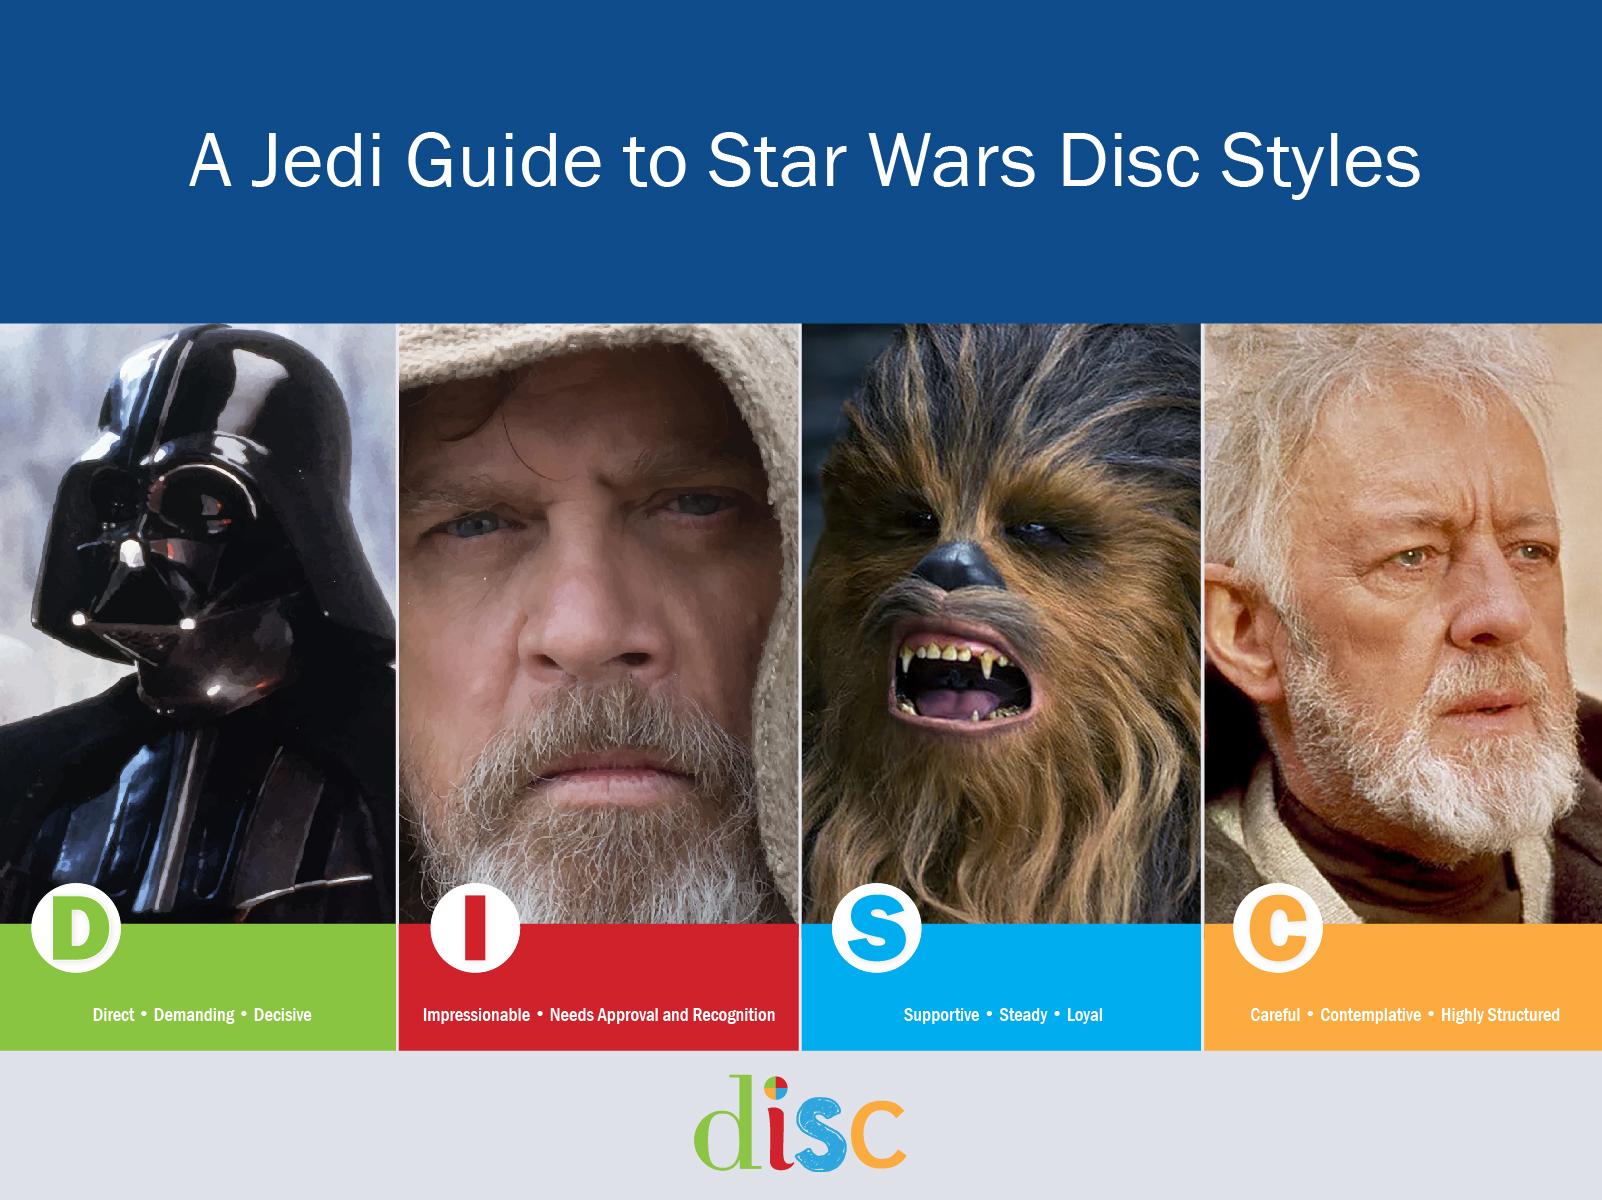 Star Wars DISC Styles